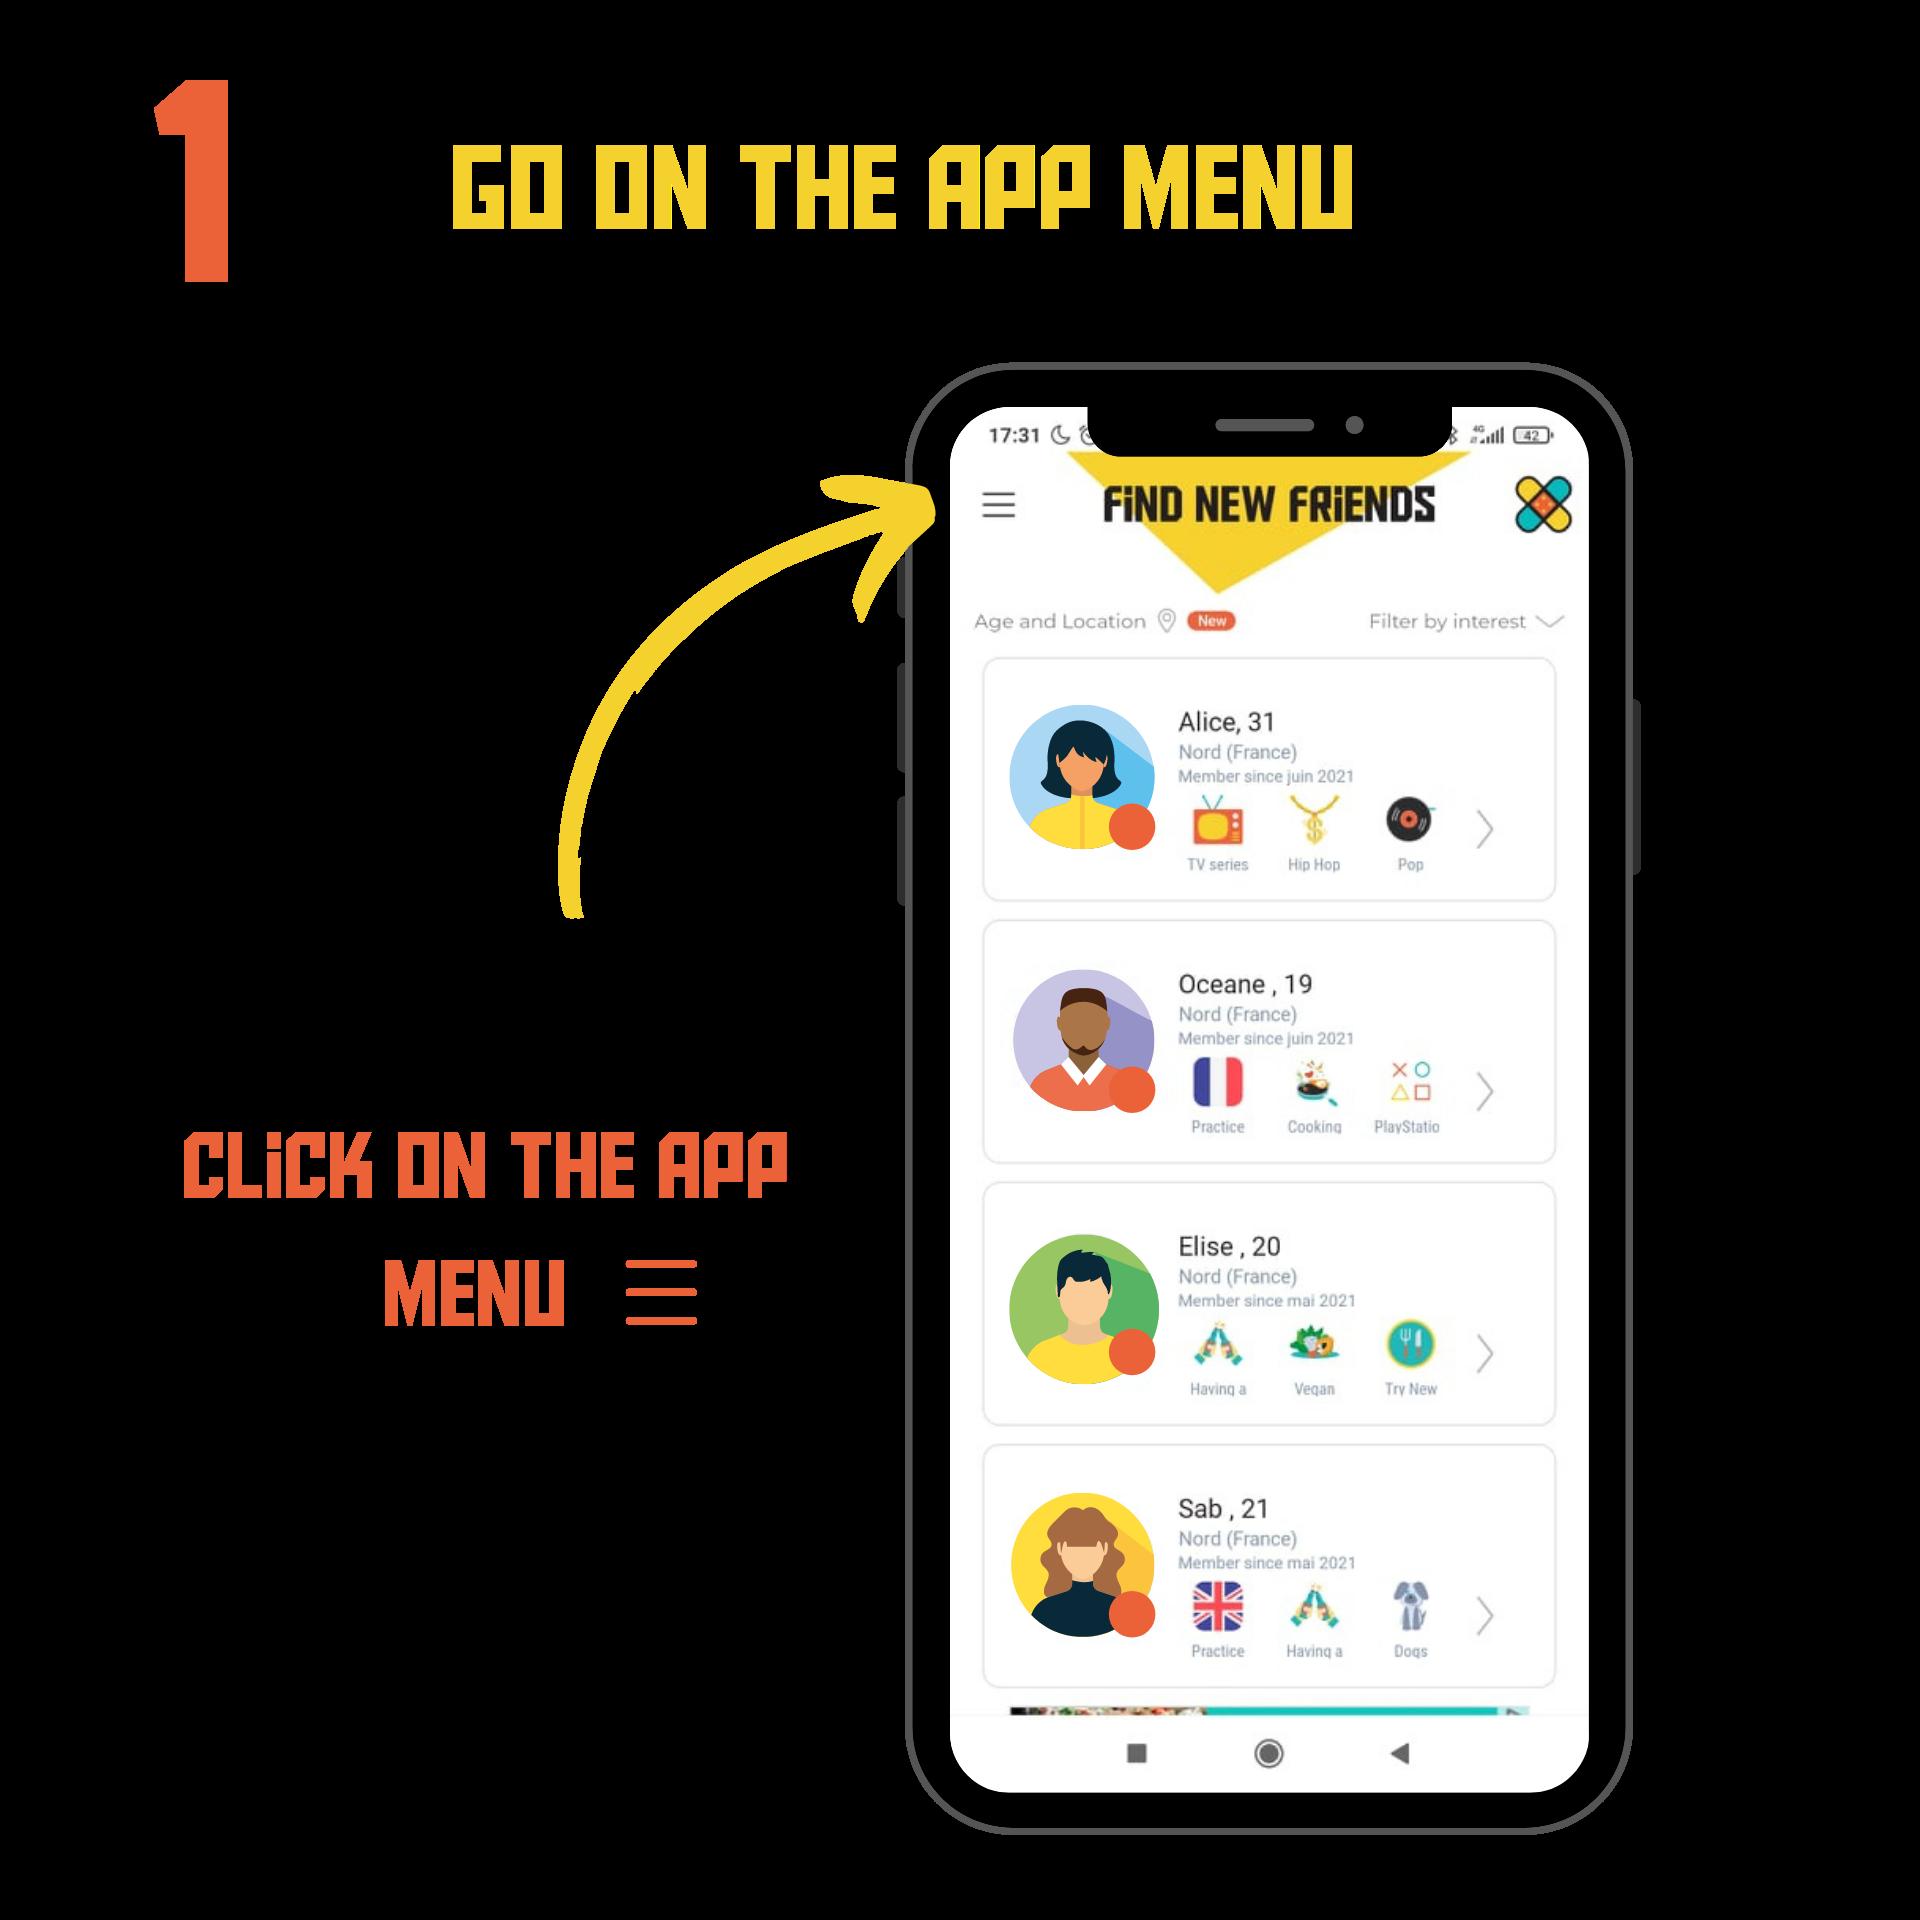 Open the app menu